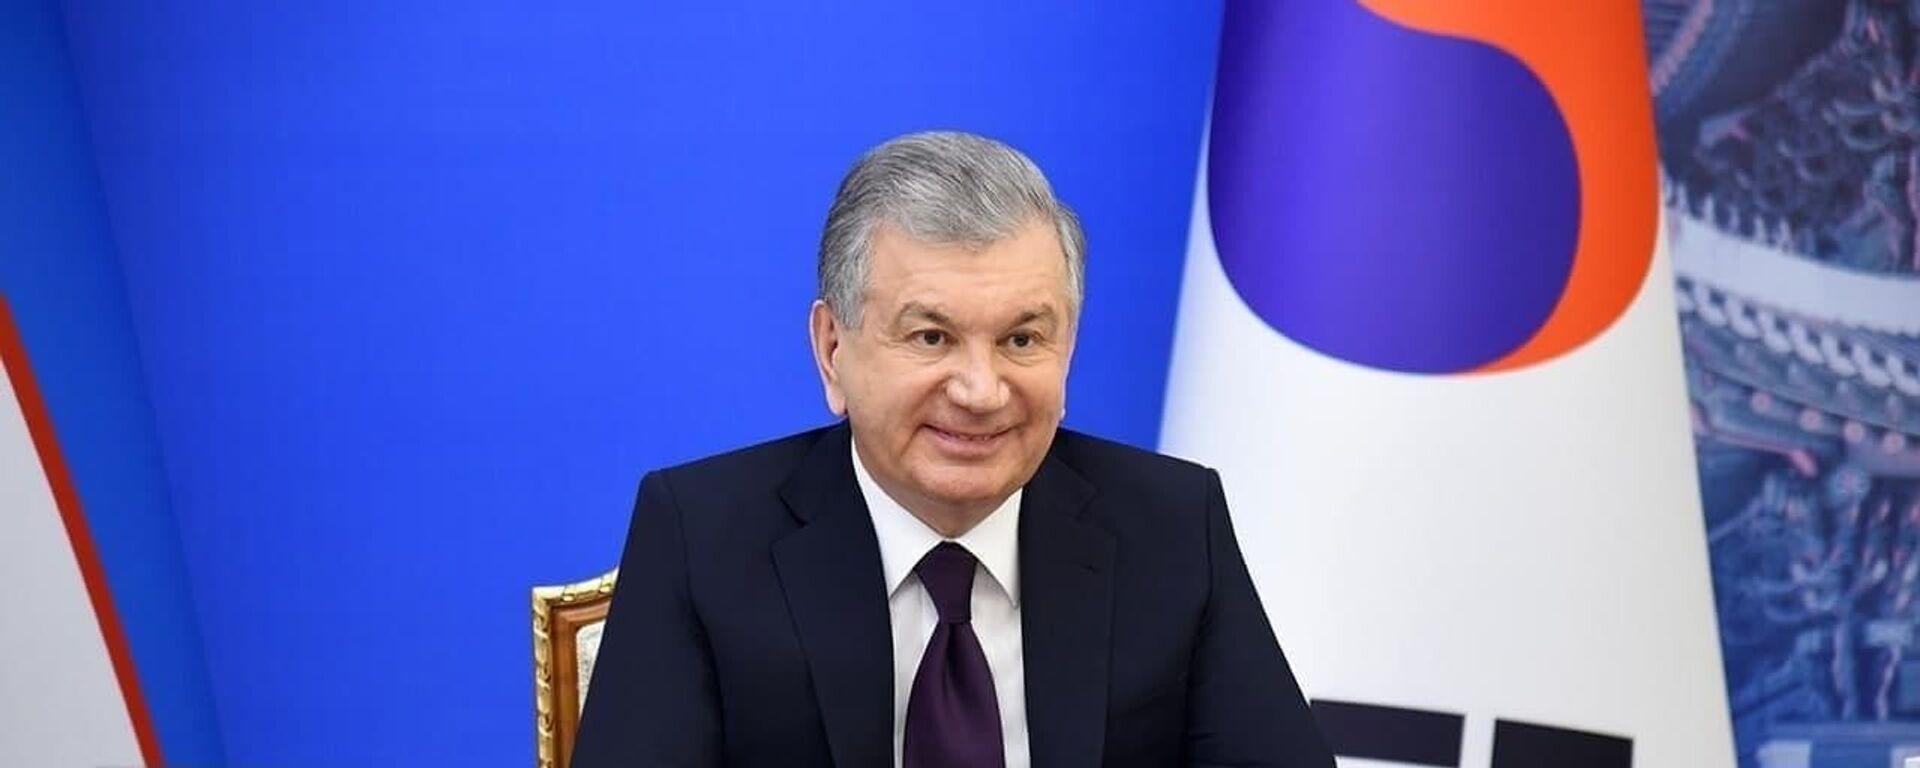 Президент Узбекистана Шавкат Мирзиёев - Sputnik Узбекистан, 1920, 28.01.2021